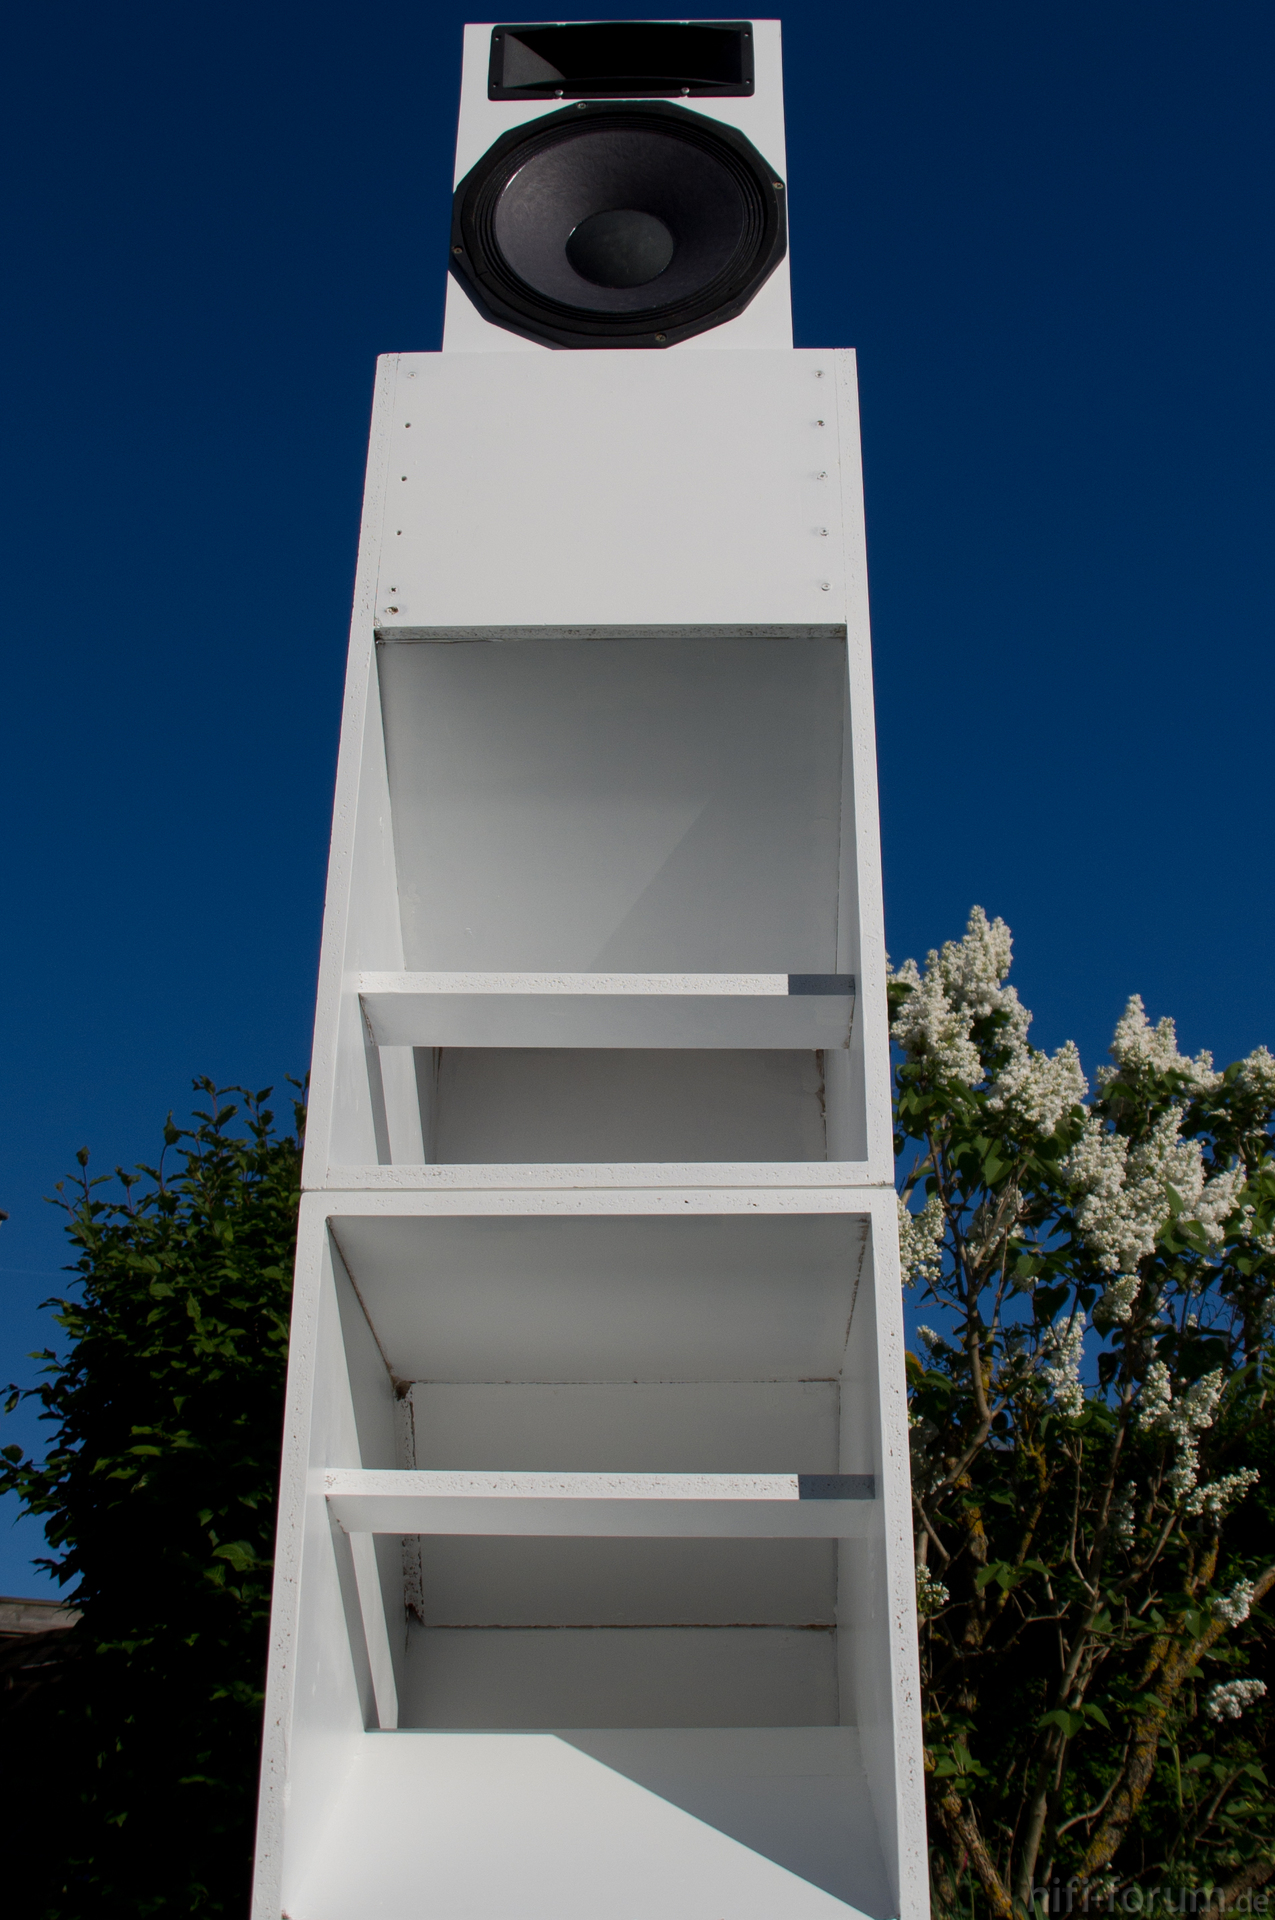 wei er rie e1 wei er hifi bildergalerie. Black Bedroom Furniture Sets. Home Design Ideas